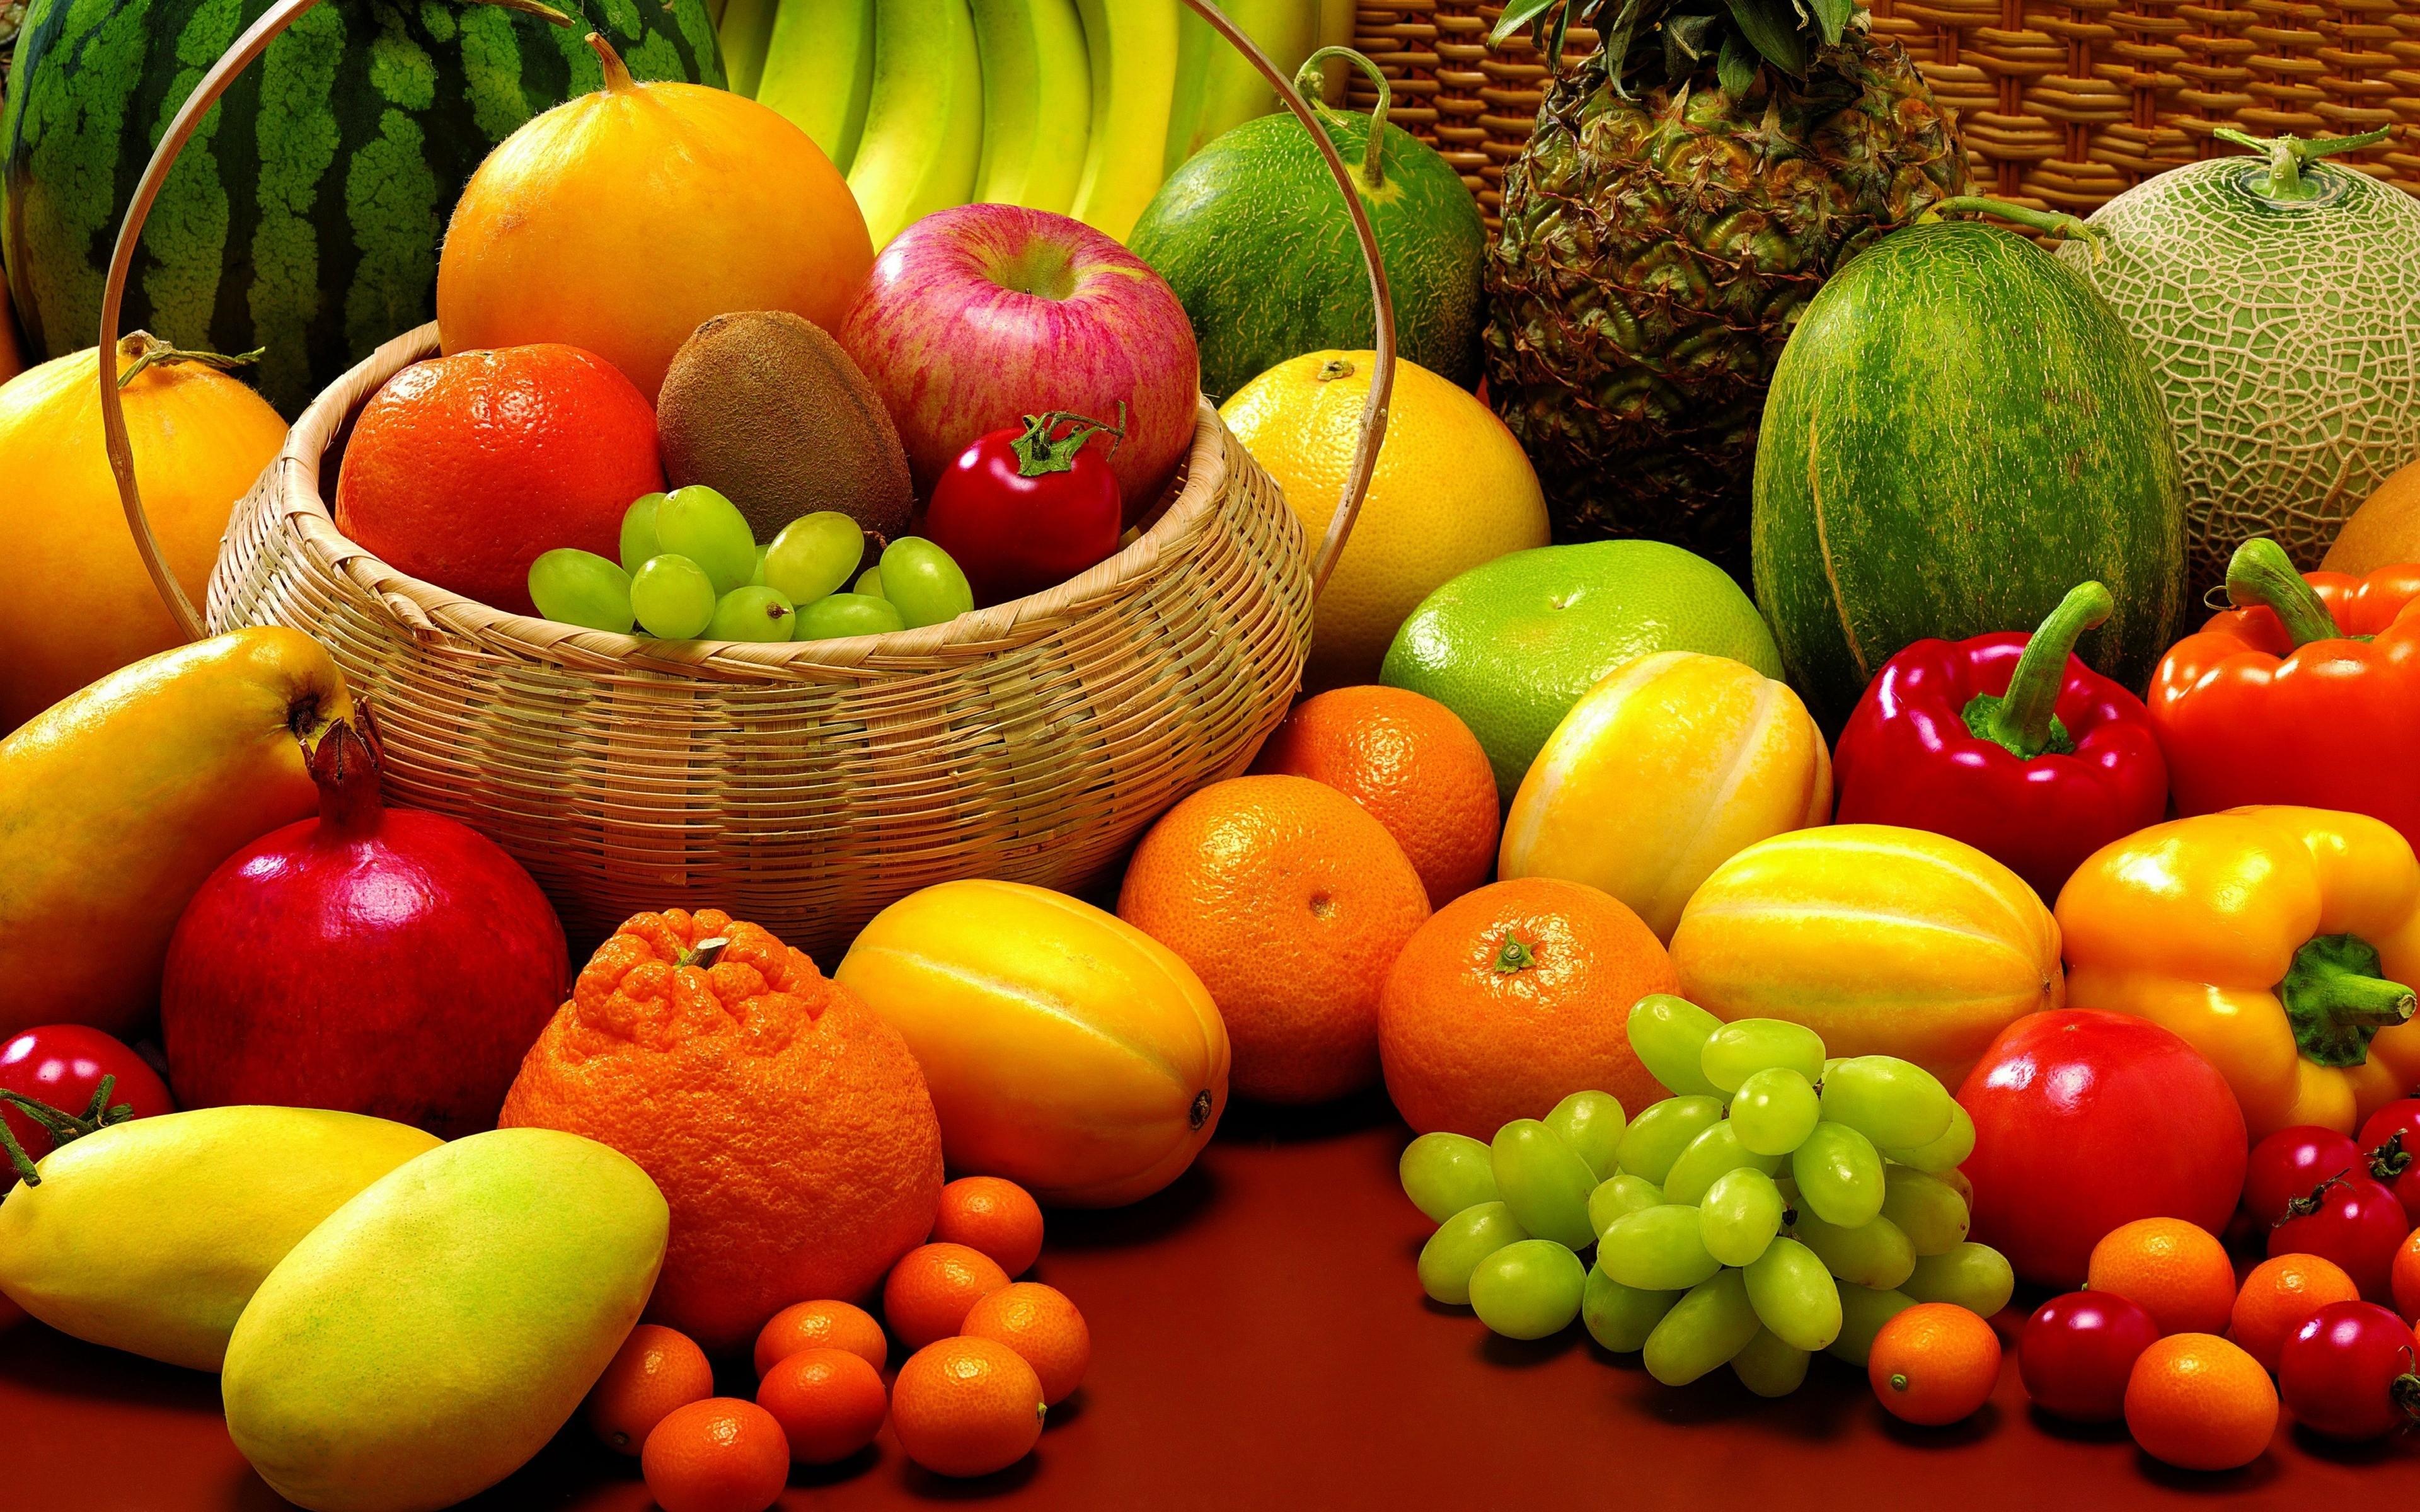 All Fruit Wallpapers Mobile Wallpaper Desktop Images Download HD 3840x2400